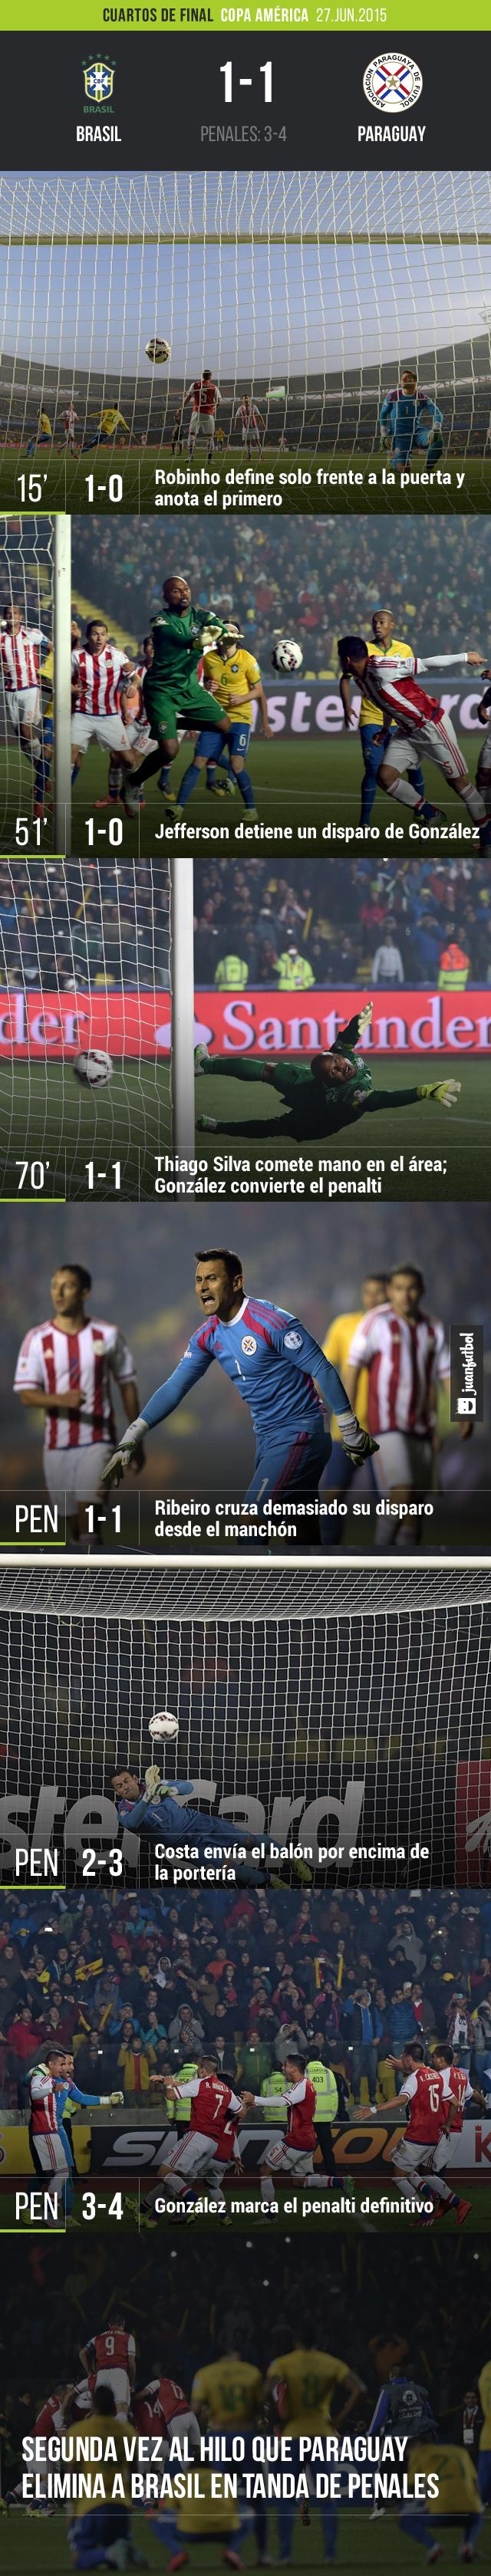 Brasil cayó desde los once pasos frente a Paraguay